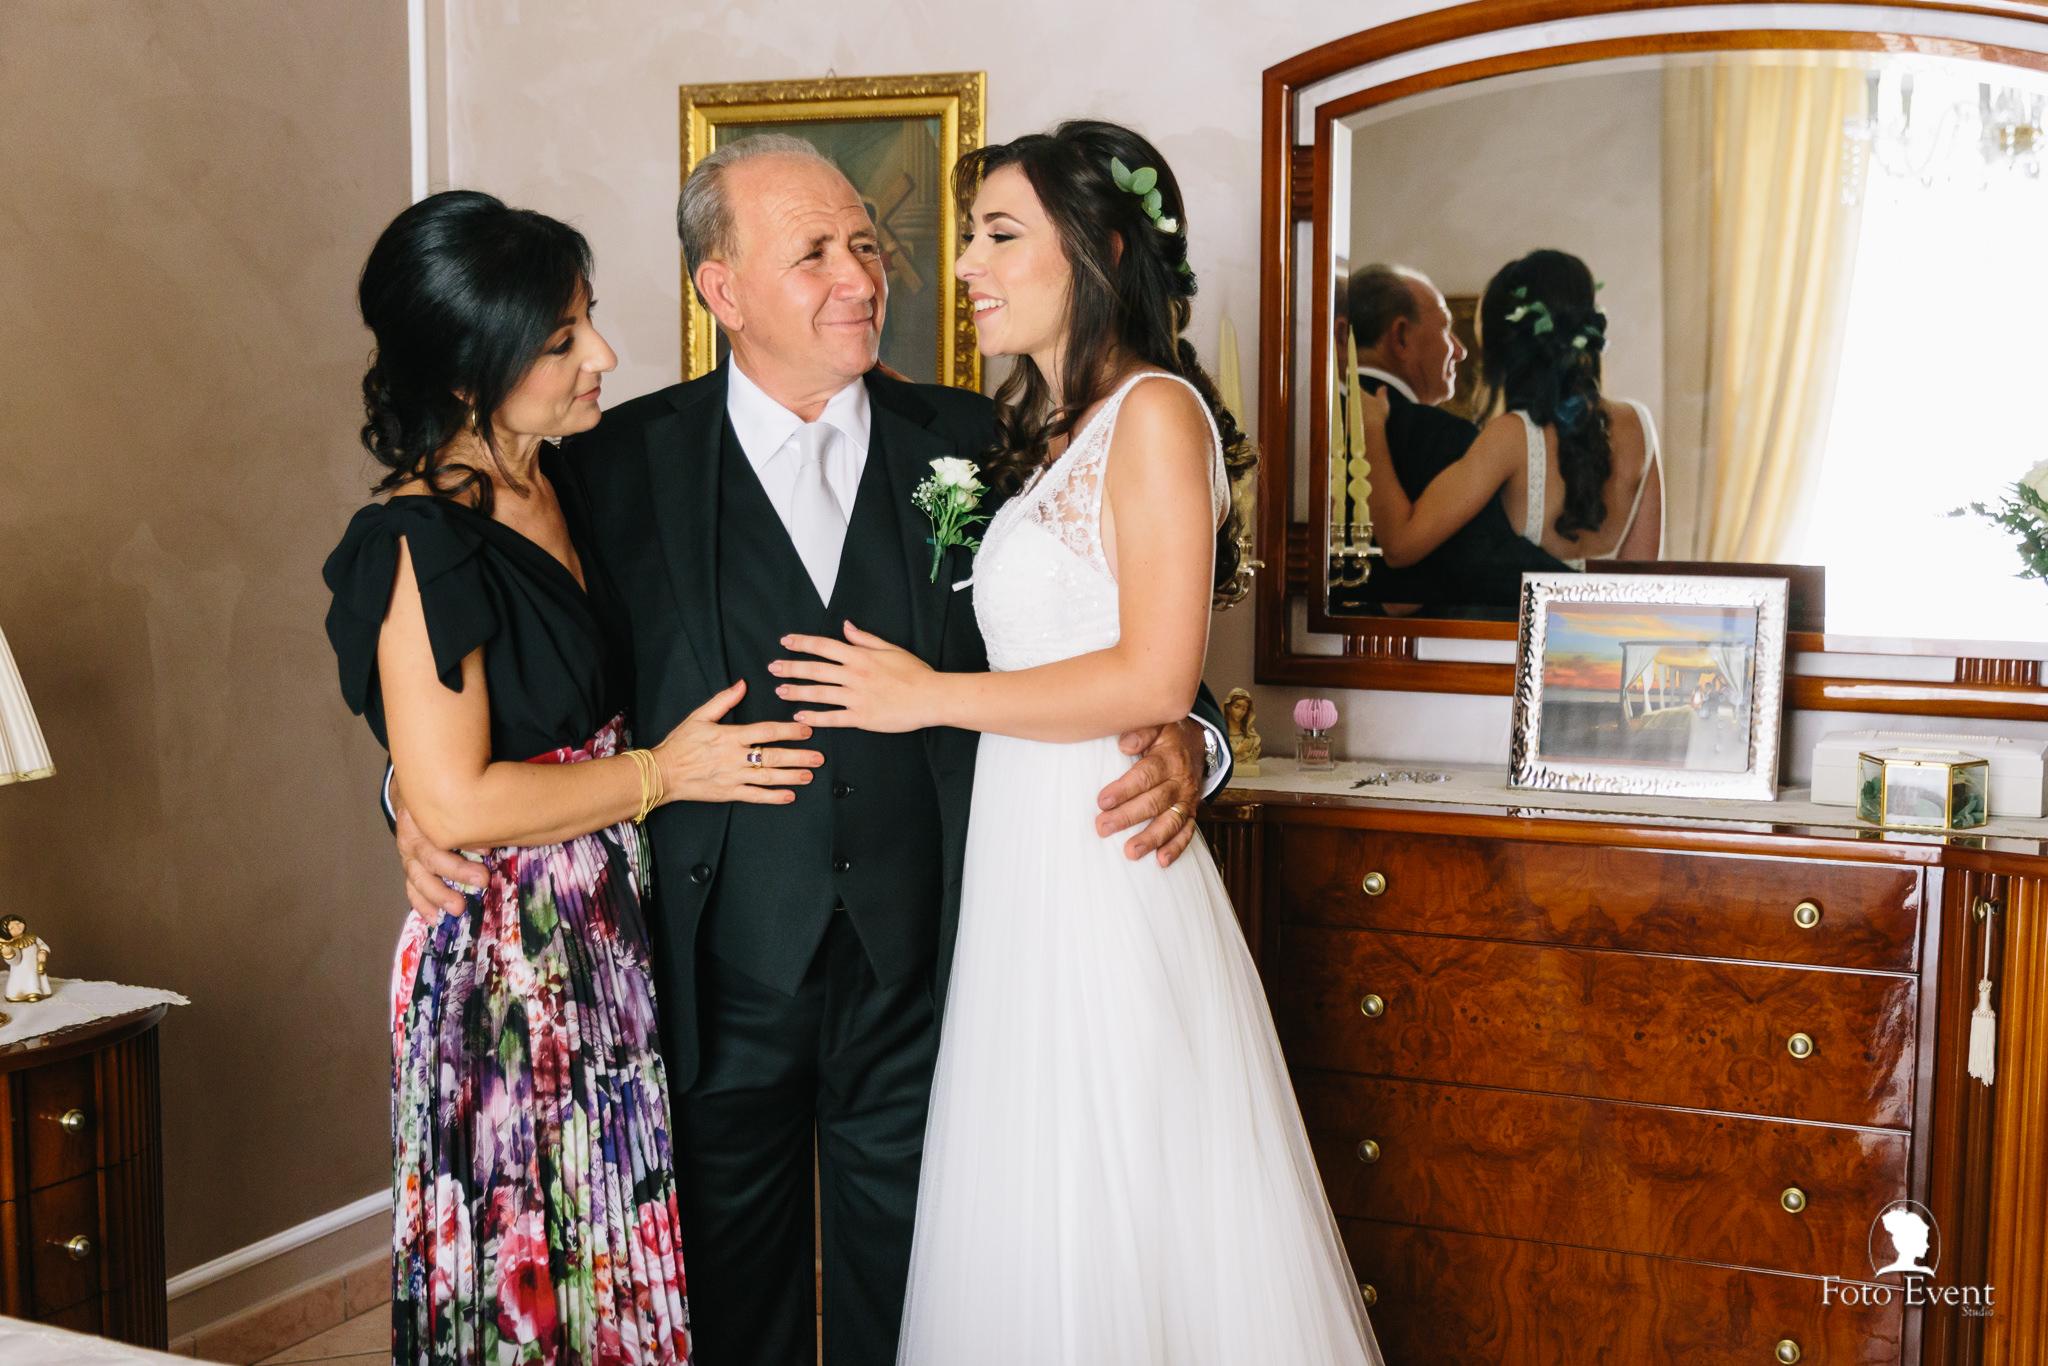 014-2019-08-23-Matrimonio-Lucia-e-Rosario-Scopelliti-5DE-724